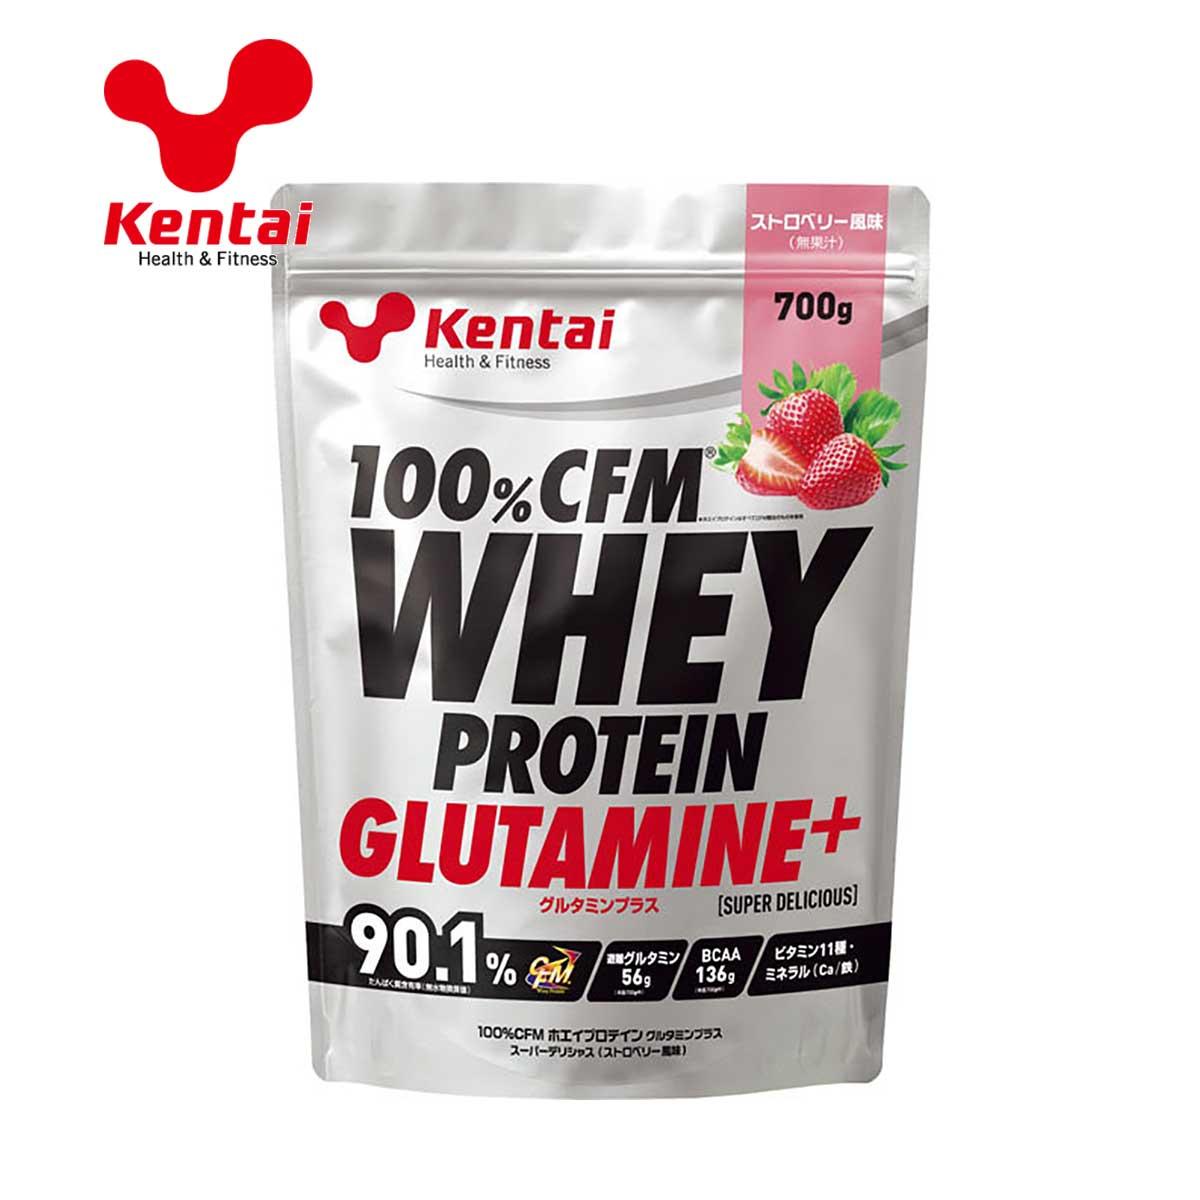 KTK-K222 100%CFM ホエイプロテイン グルタミンプラスに風味を施し 高純度のプロテインをおいしく摂取 Kentai 健康体力研究所 スーパーデリシャス グルタミンプラス 100%CFM 激安セール ストロベリー風味 定番キャンバス